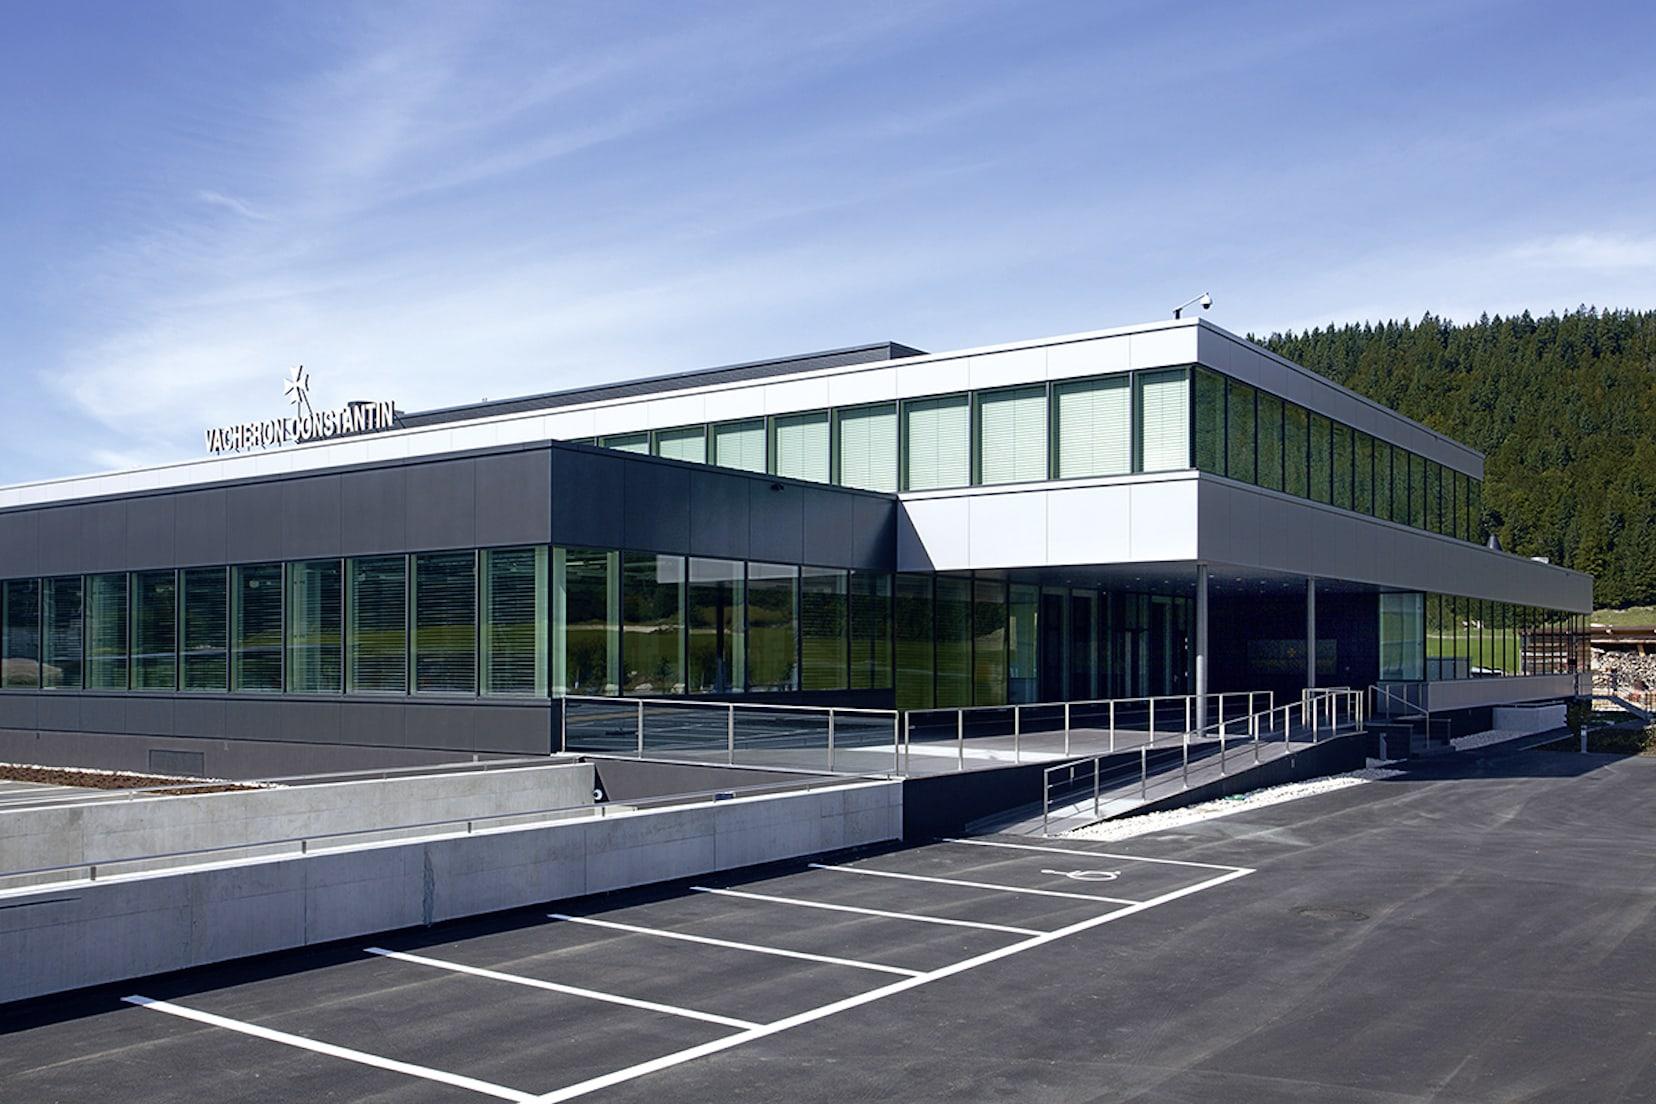 1998 - Vacheron Constantin consolidates its presence in the Vallée de Joux